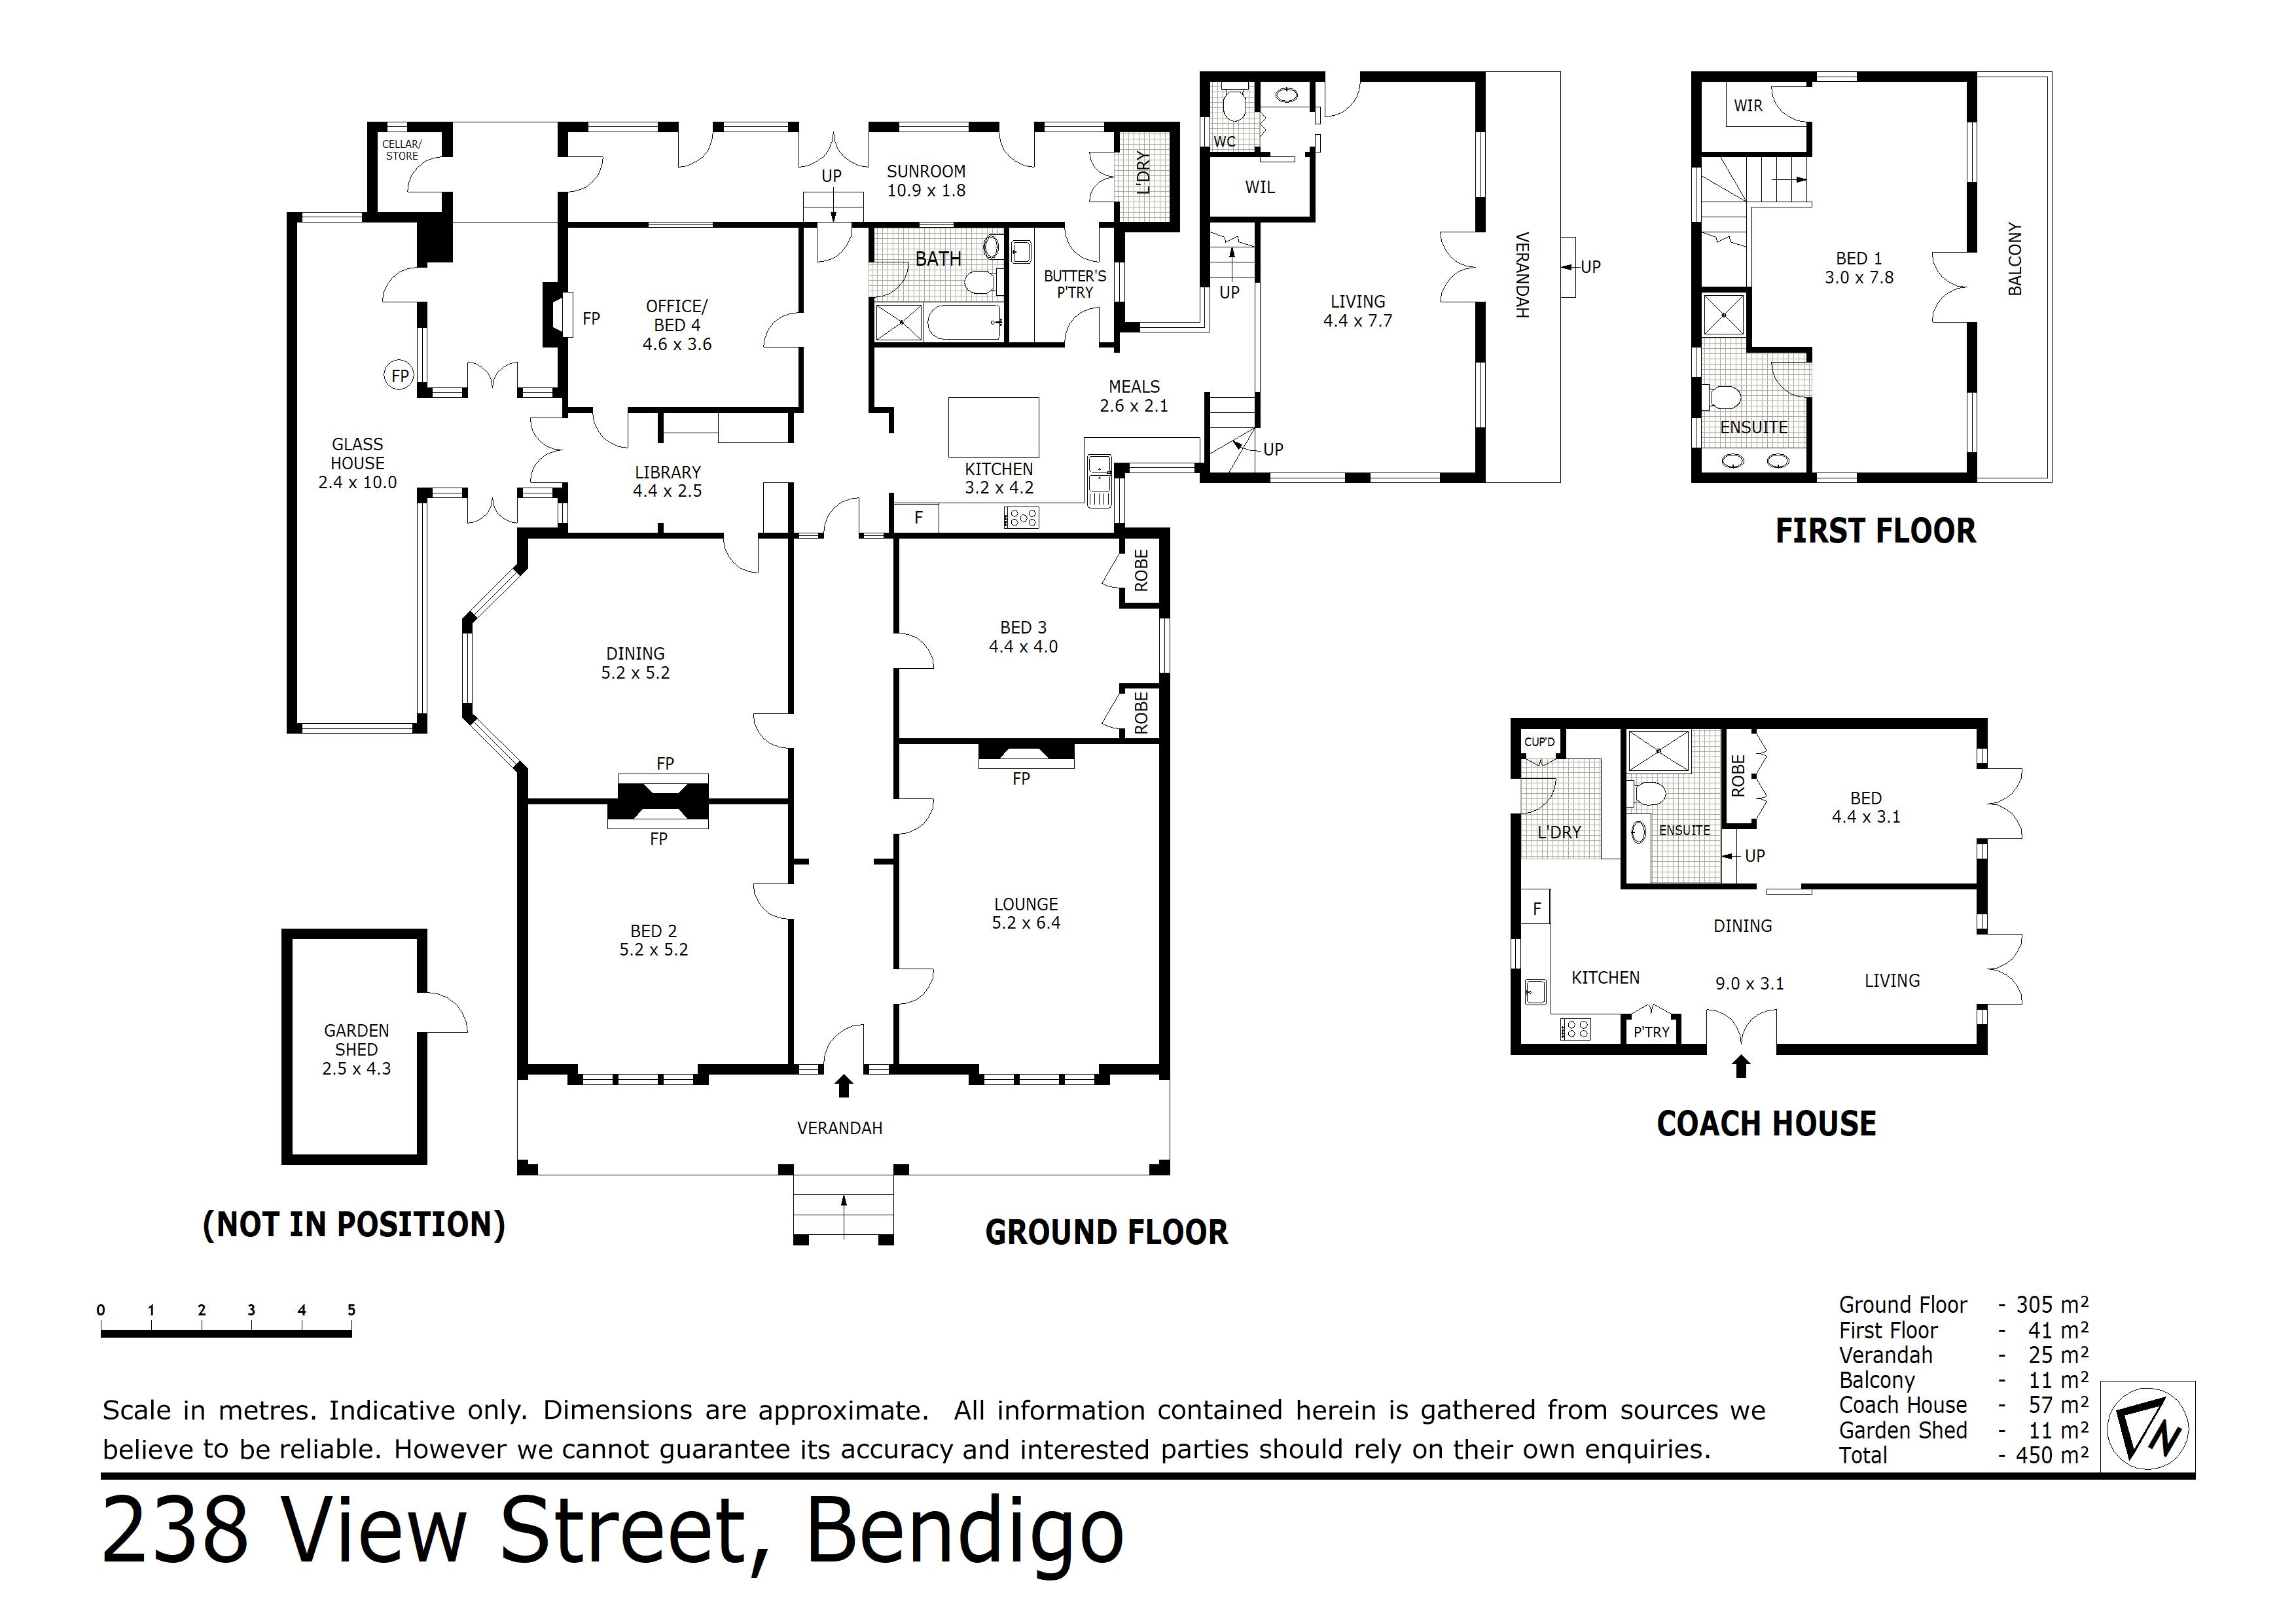 238 View Street, Bendigo, VIC 3550